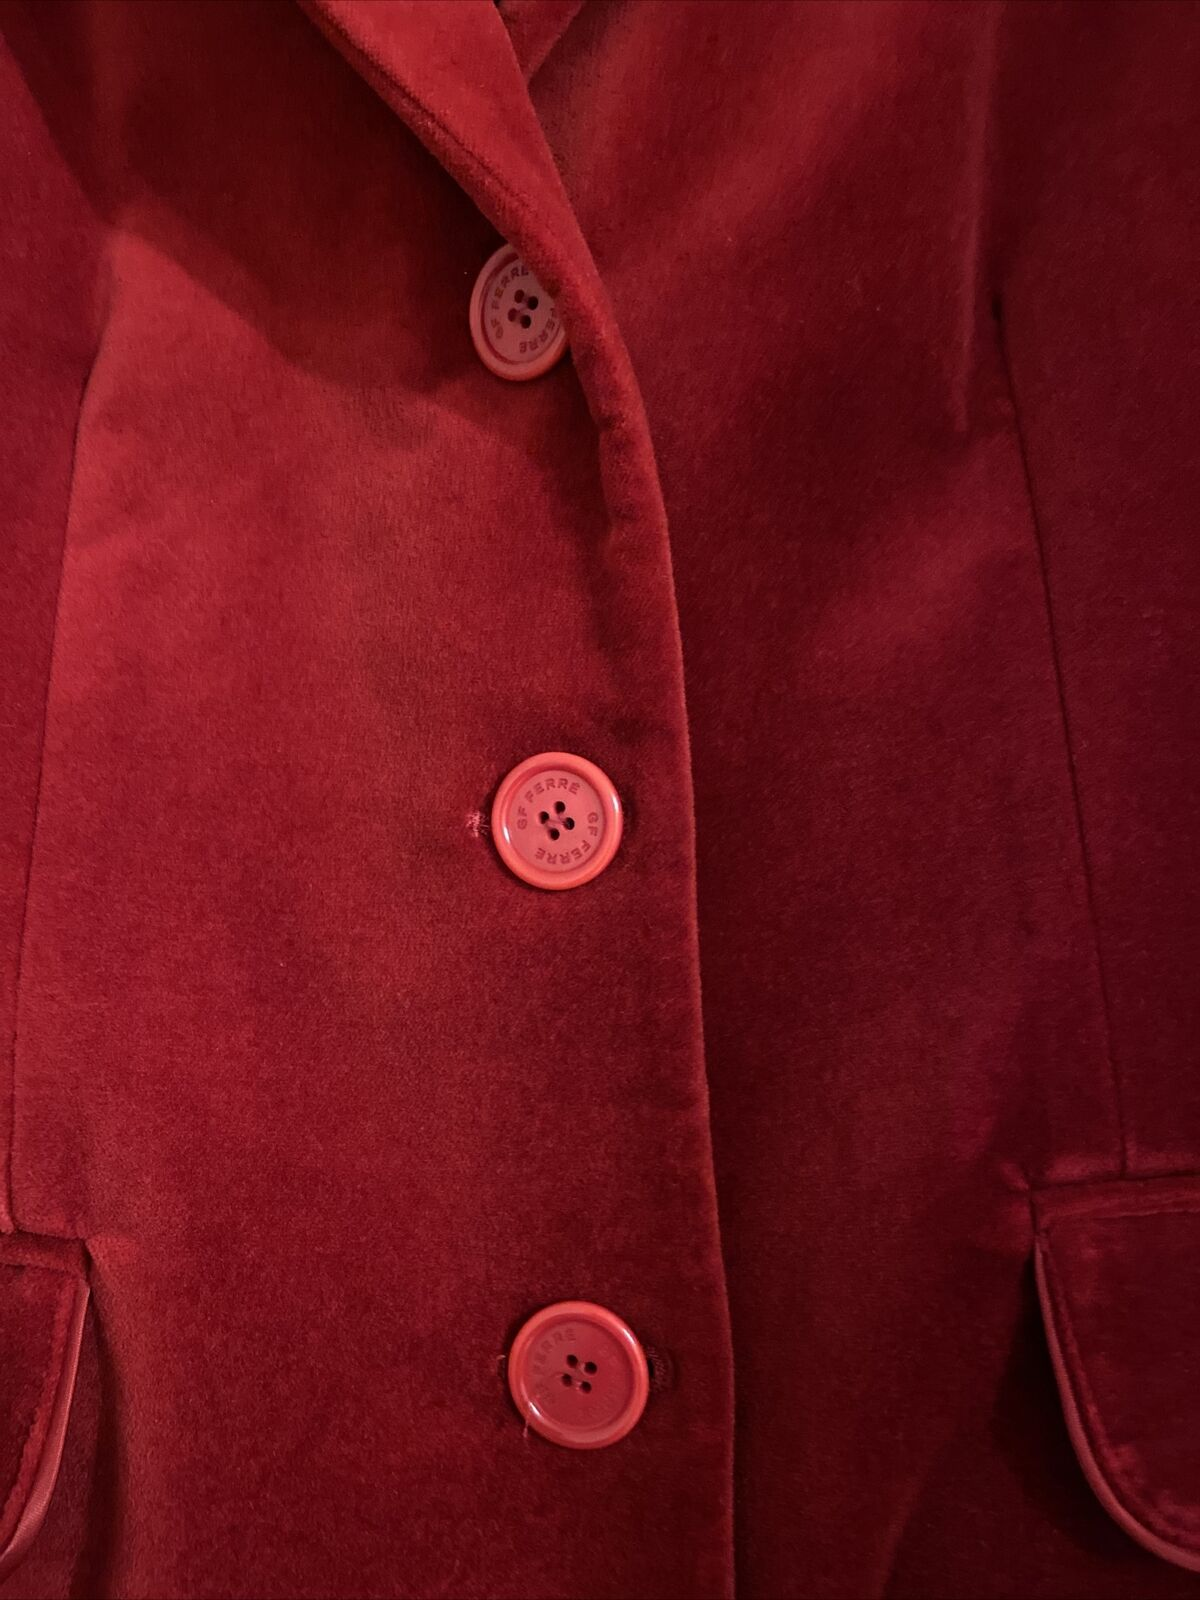 GF FERRE Vintage Red Velvet Velour Jacket Blazer … - image 2